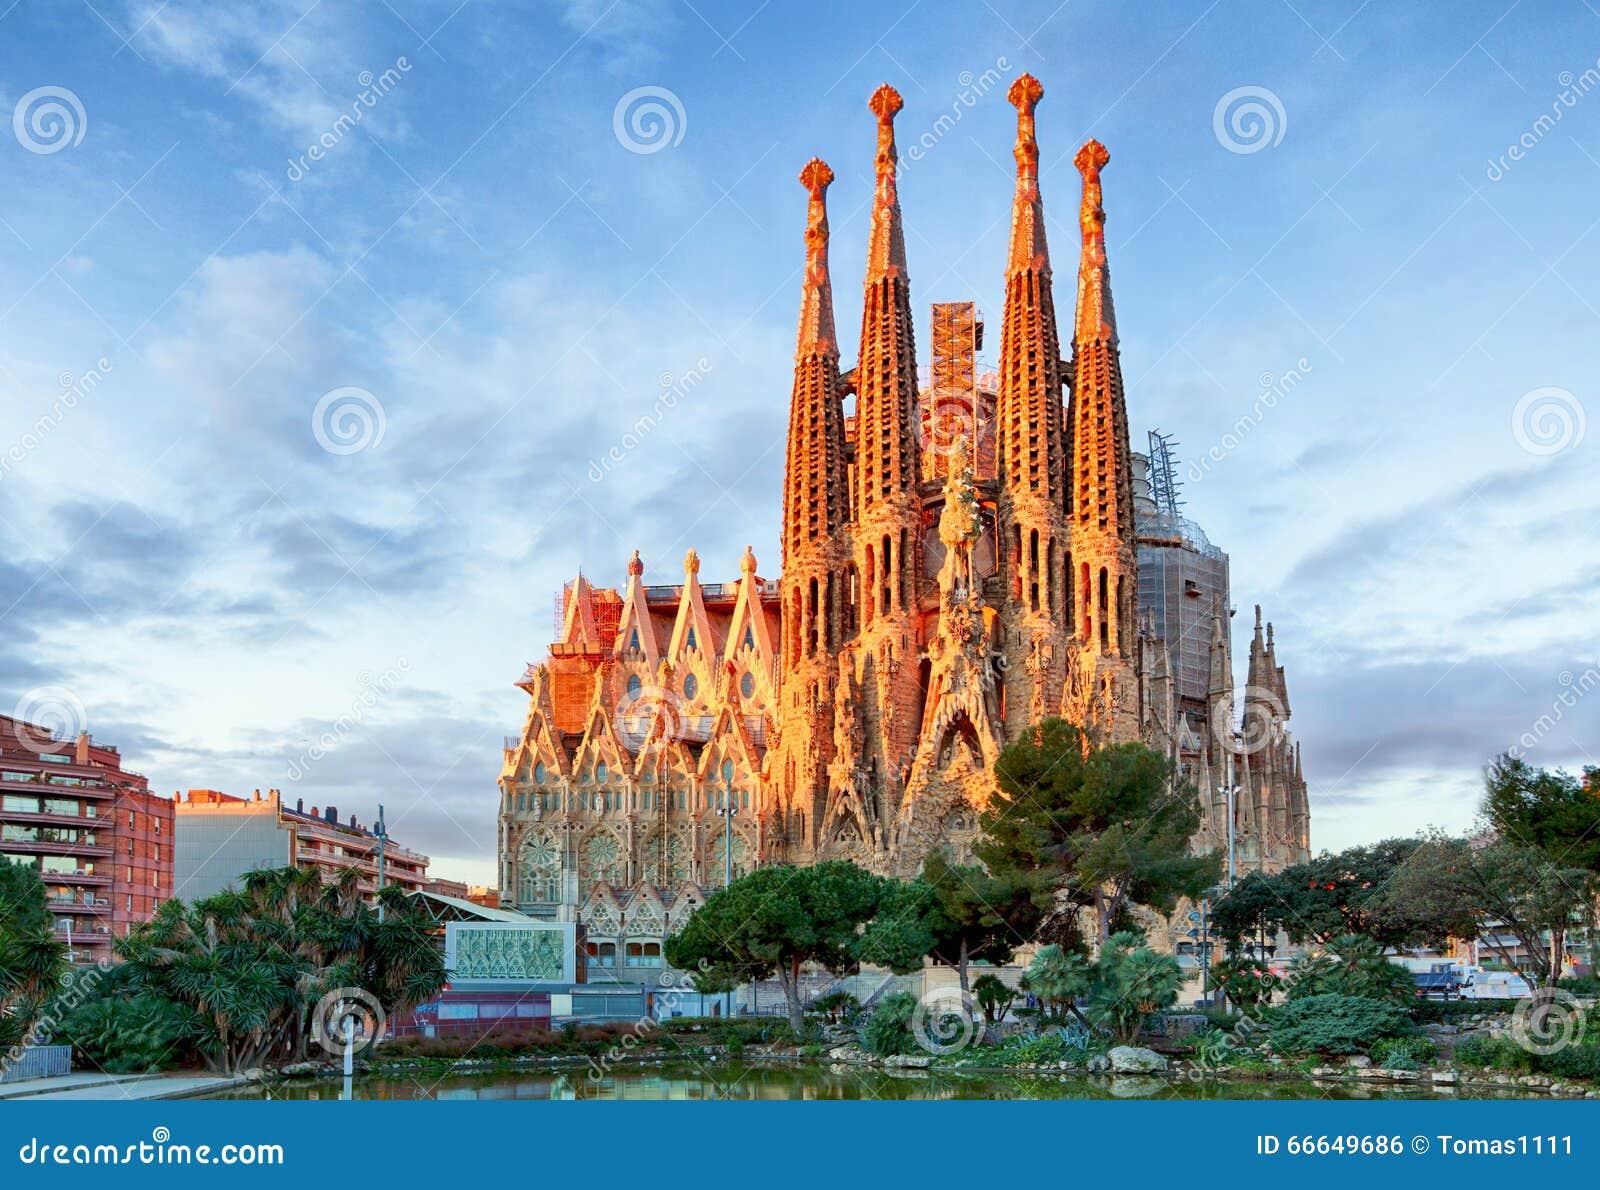 BARCELONA, SPAIN - FEBRUARY 10: La Sagrada Familia